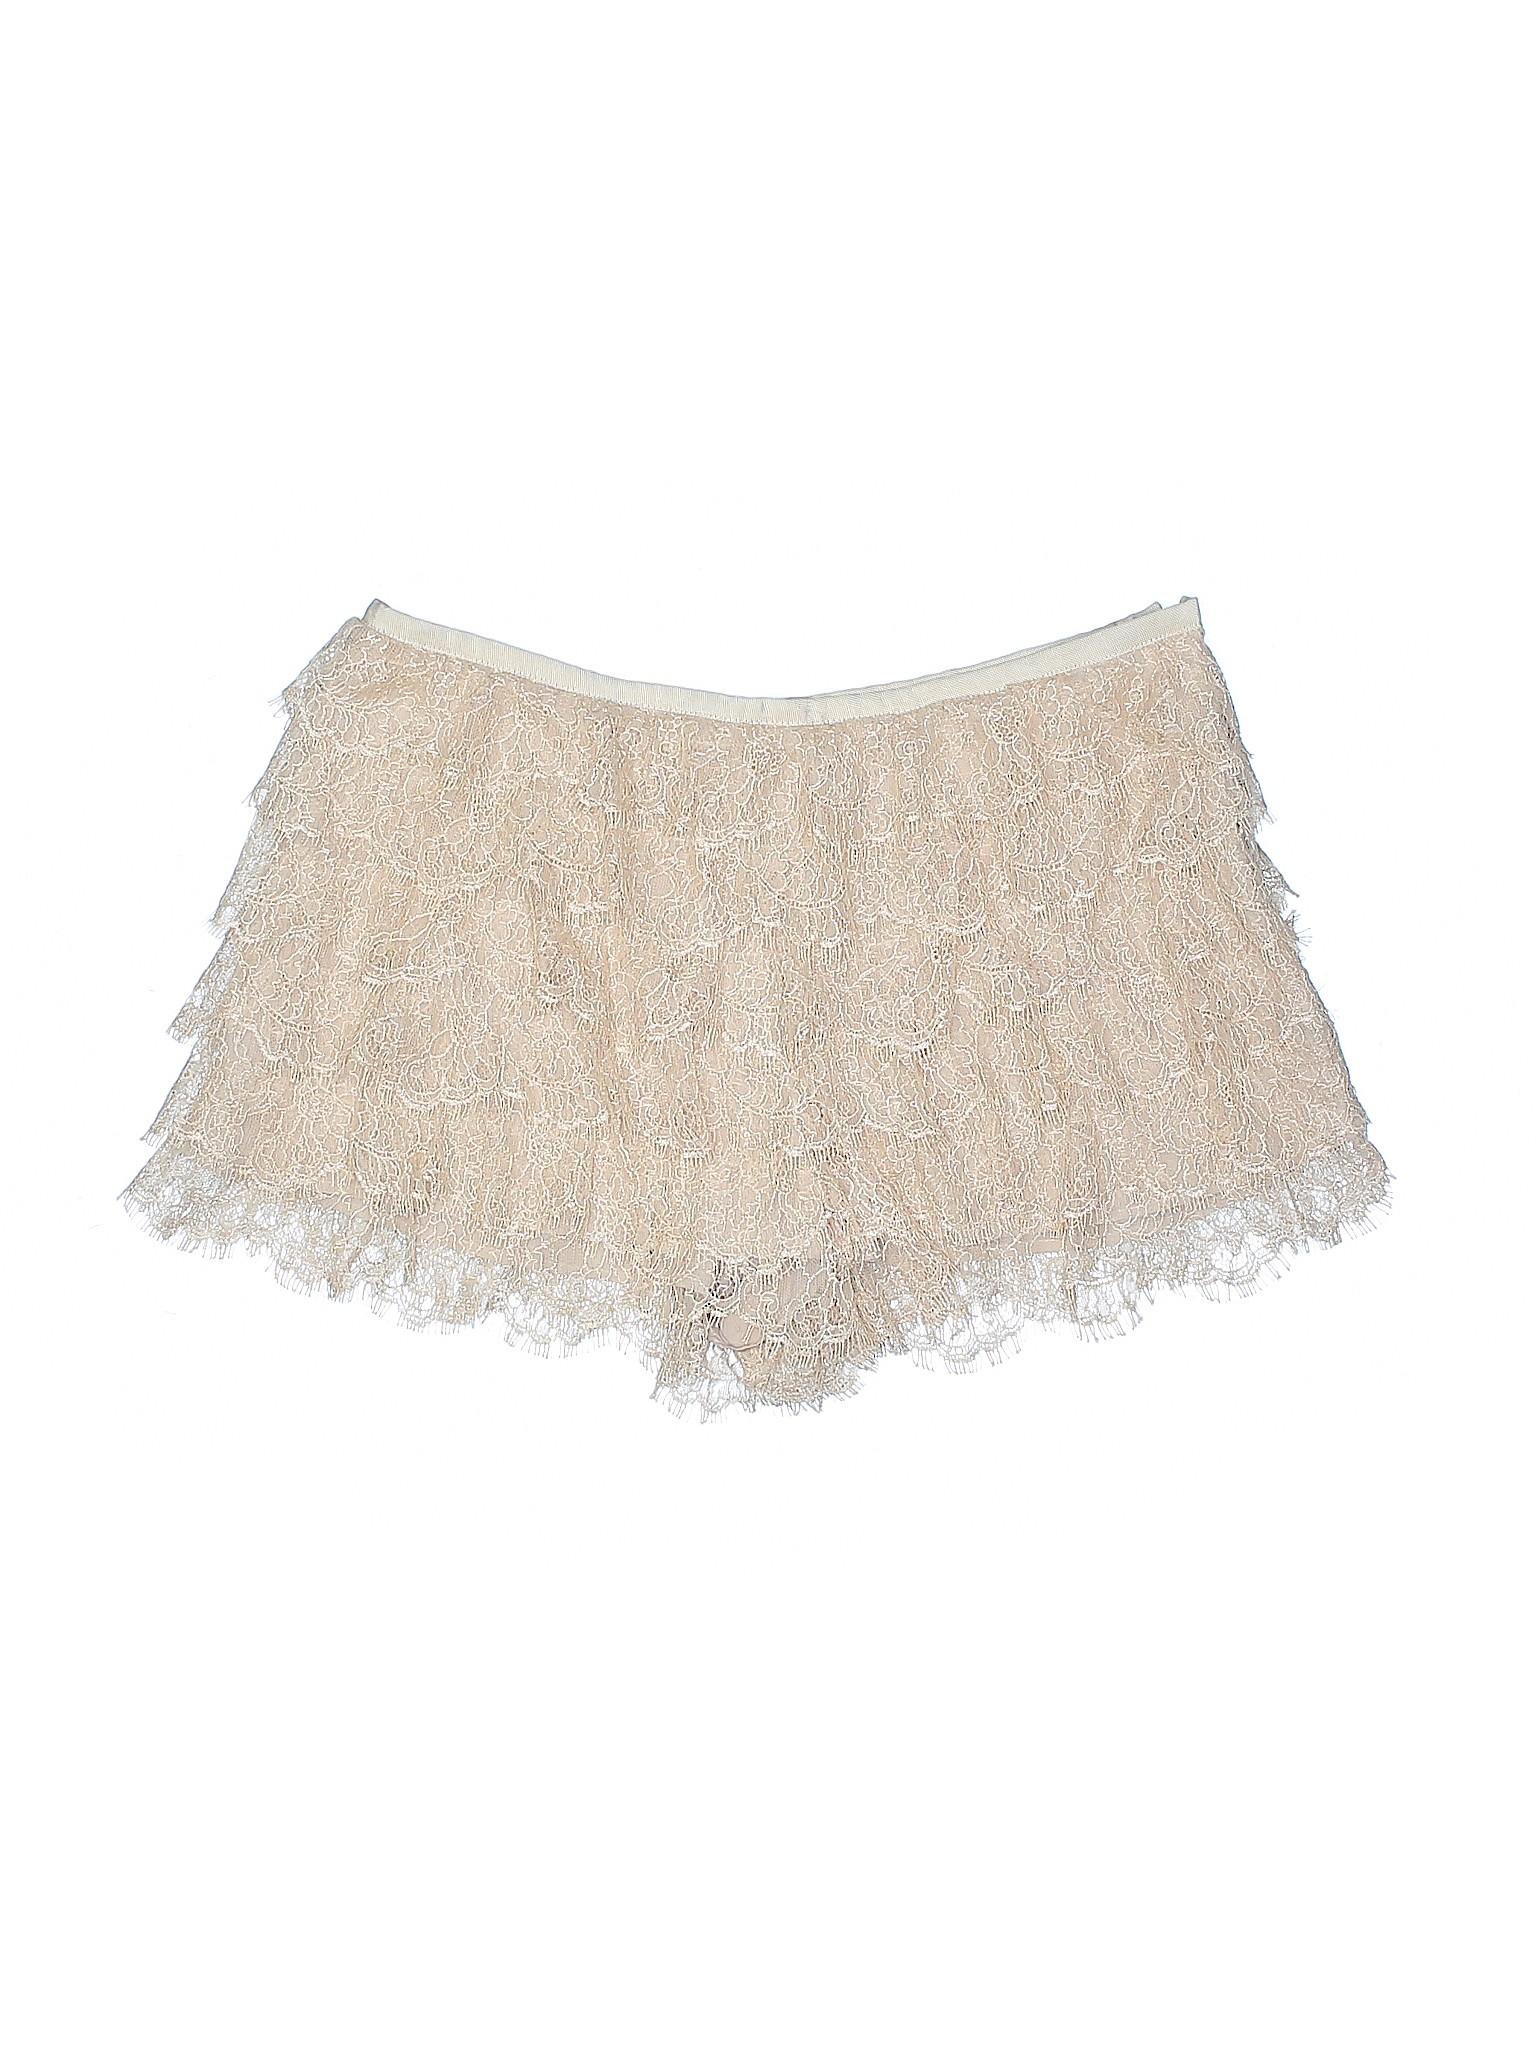 Dressy Dressy Shorts Haute Haute Hippie Hippie Boutique Boutique Boutique Shorts wgqFCI